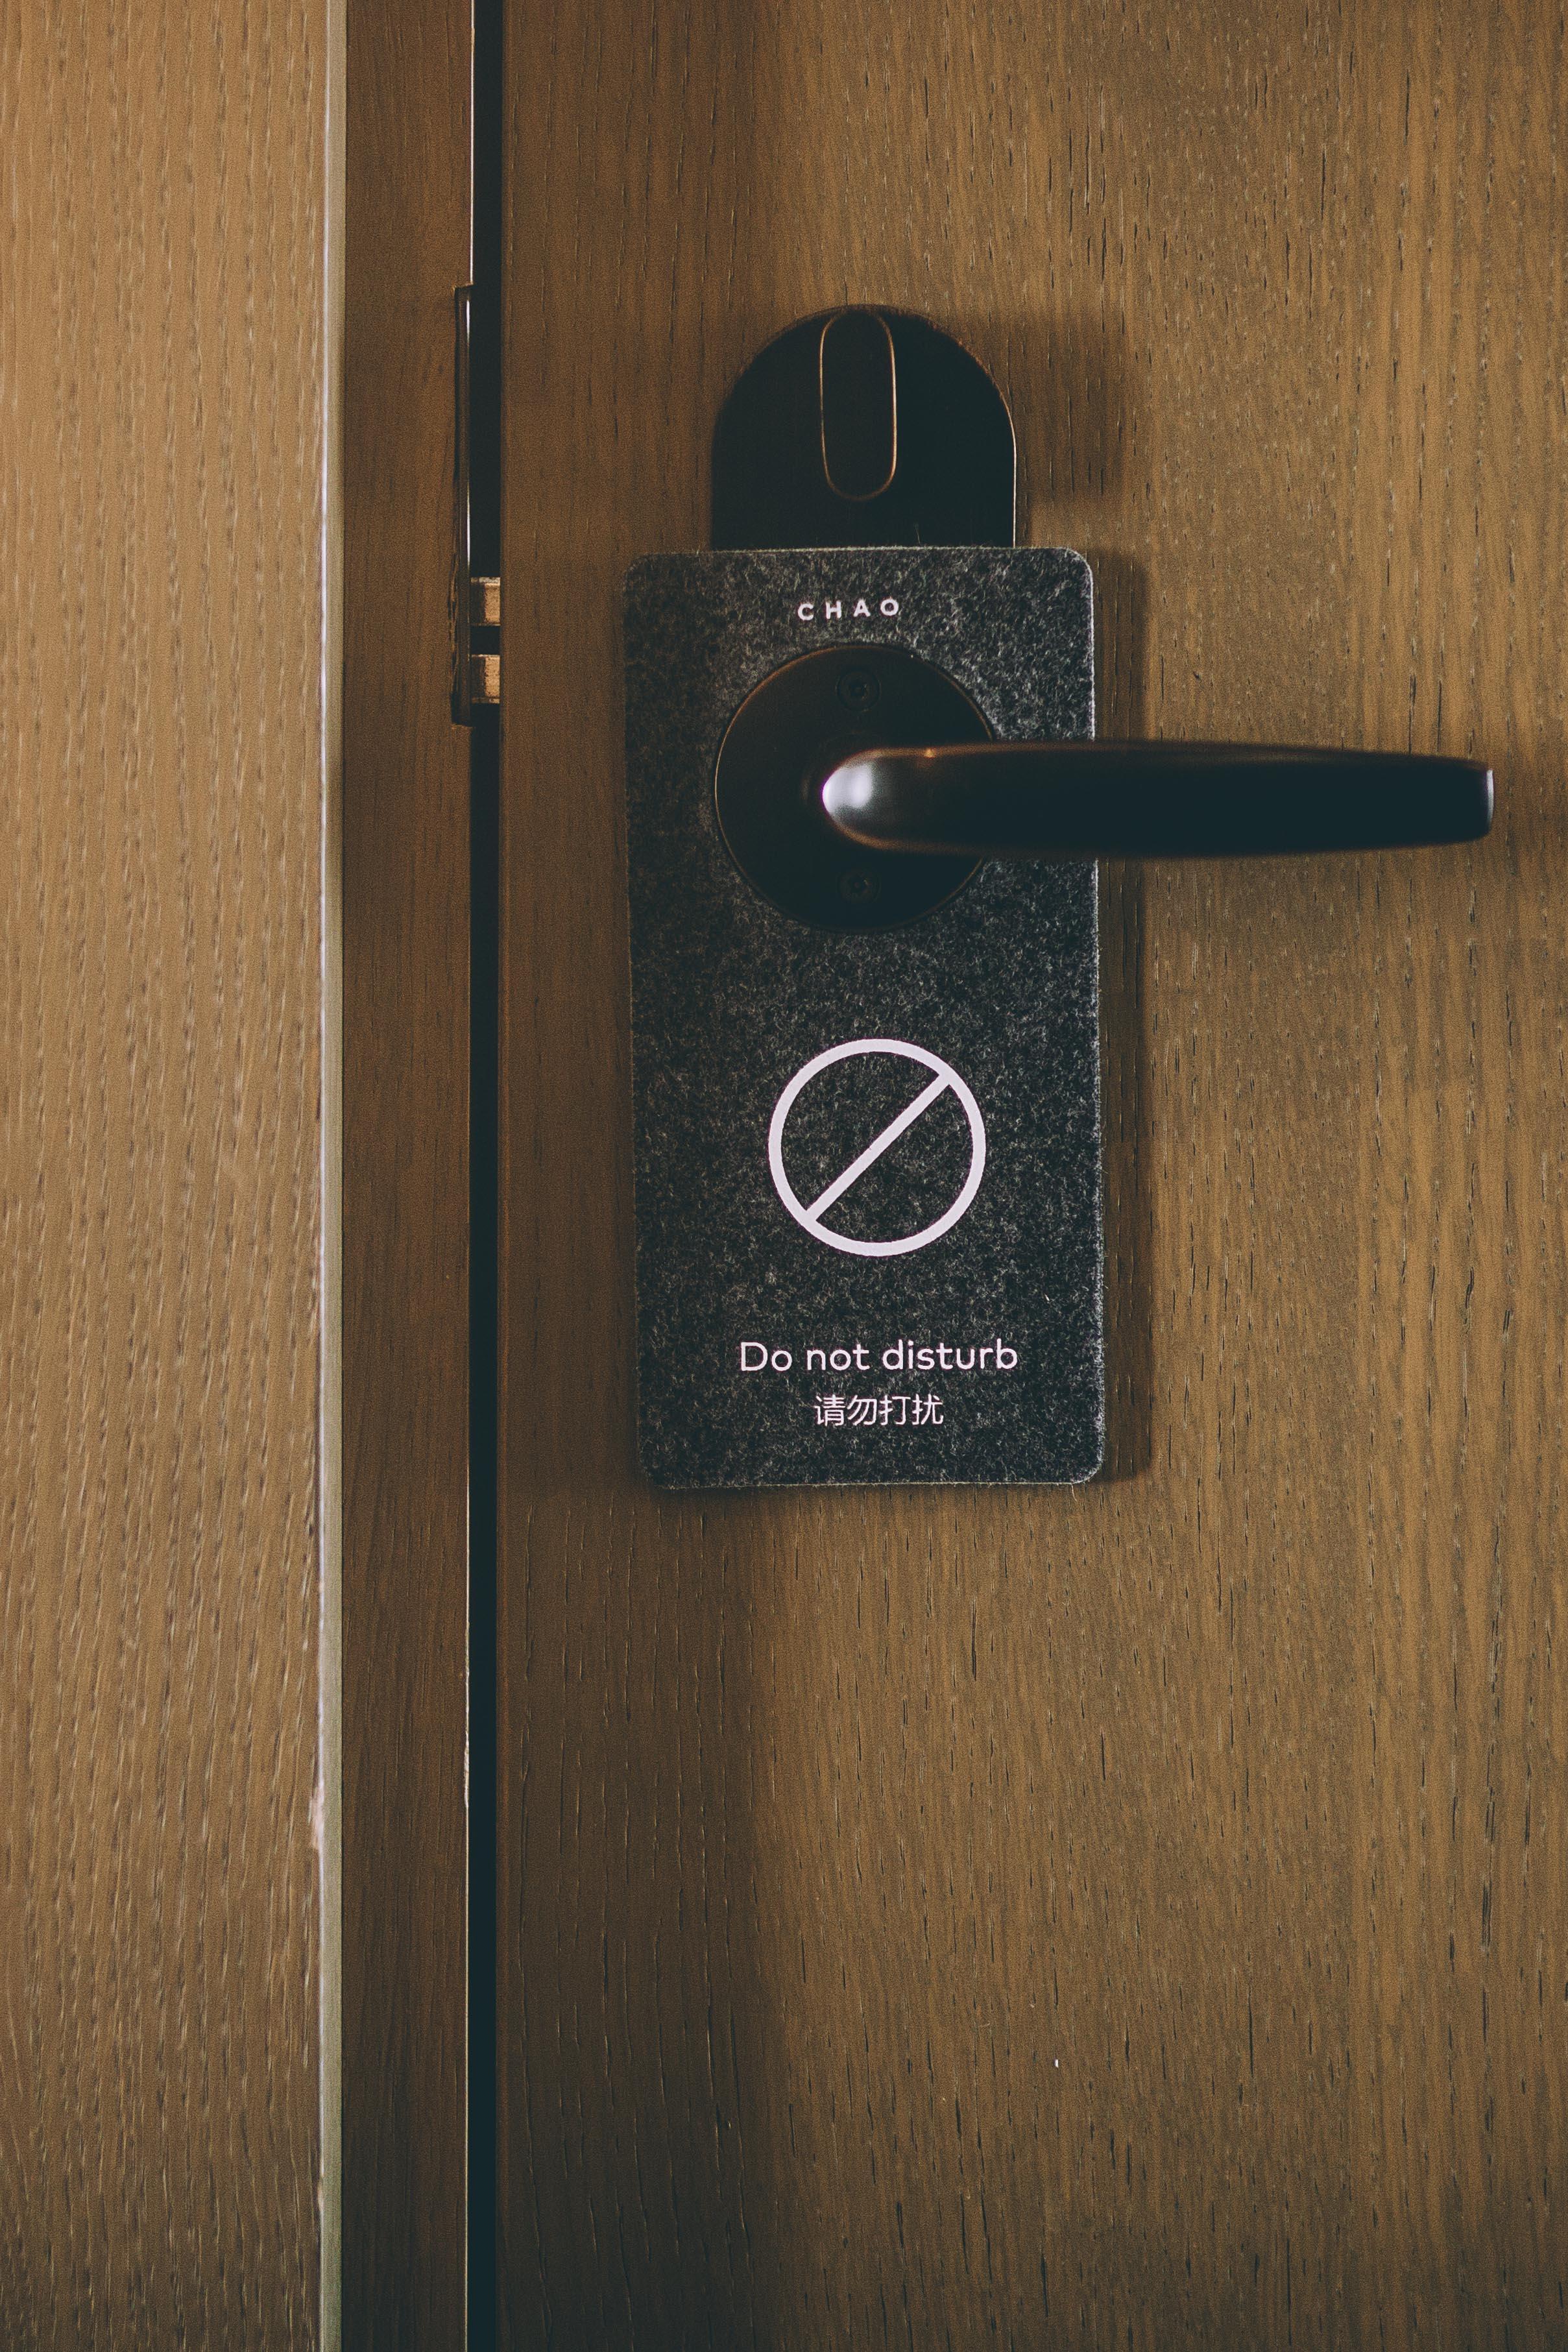 Please do not disturb. I am disturbed enough already   The door Hanger